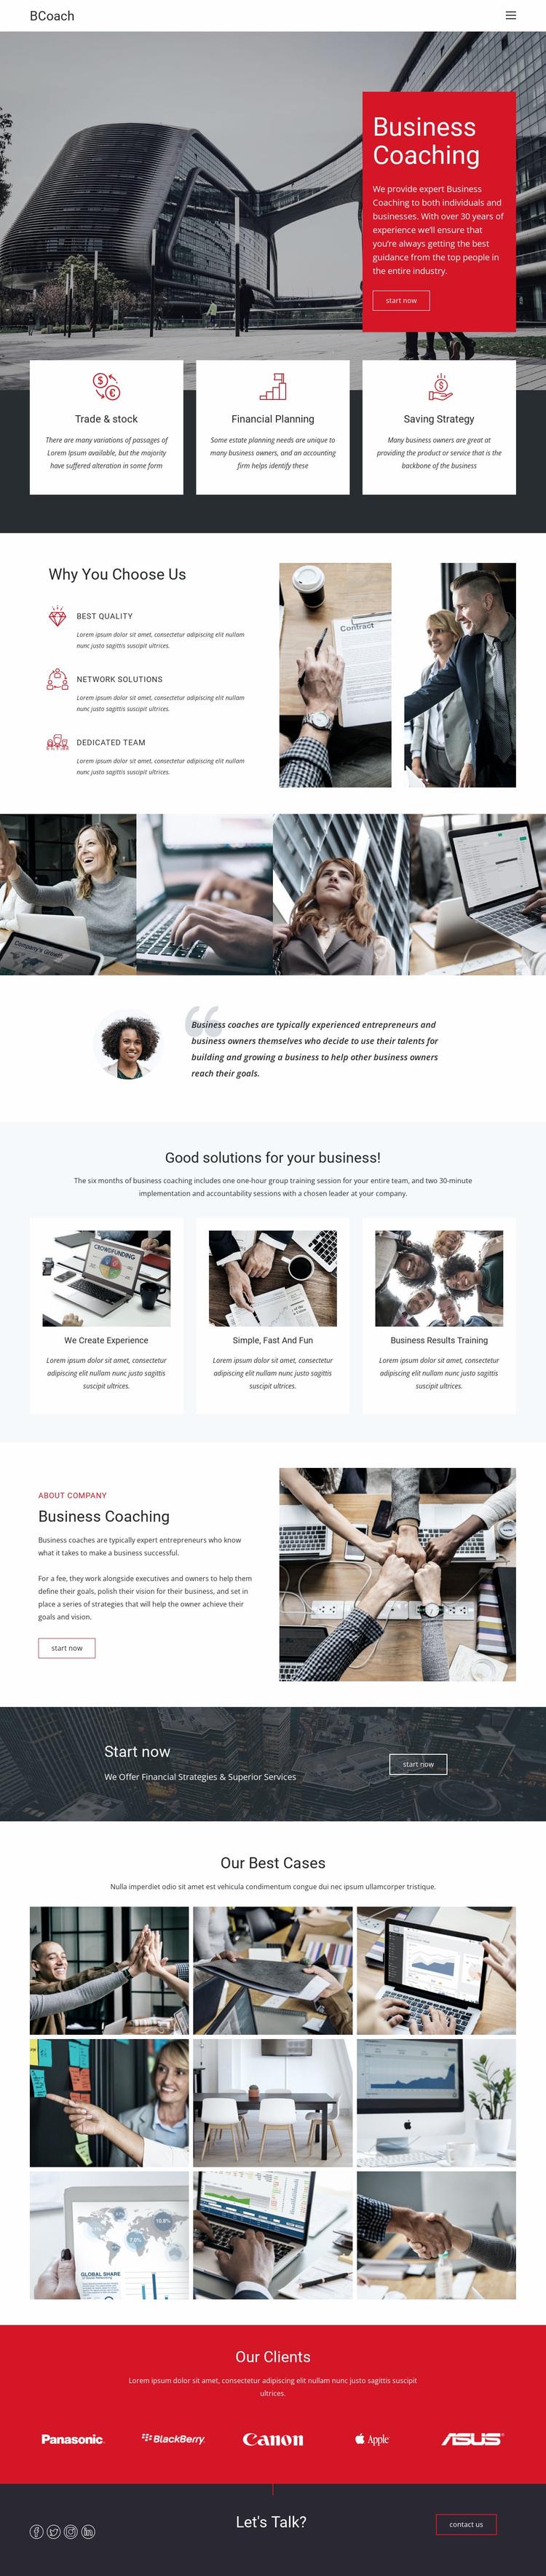 Executive coaching Website Design